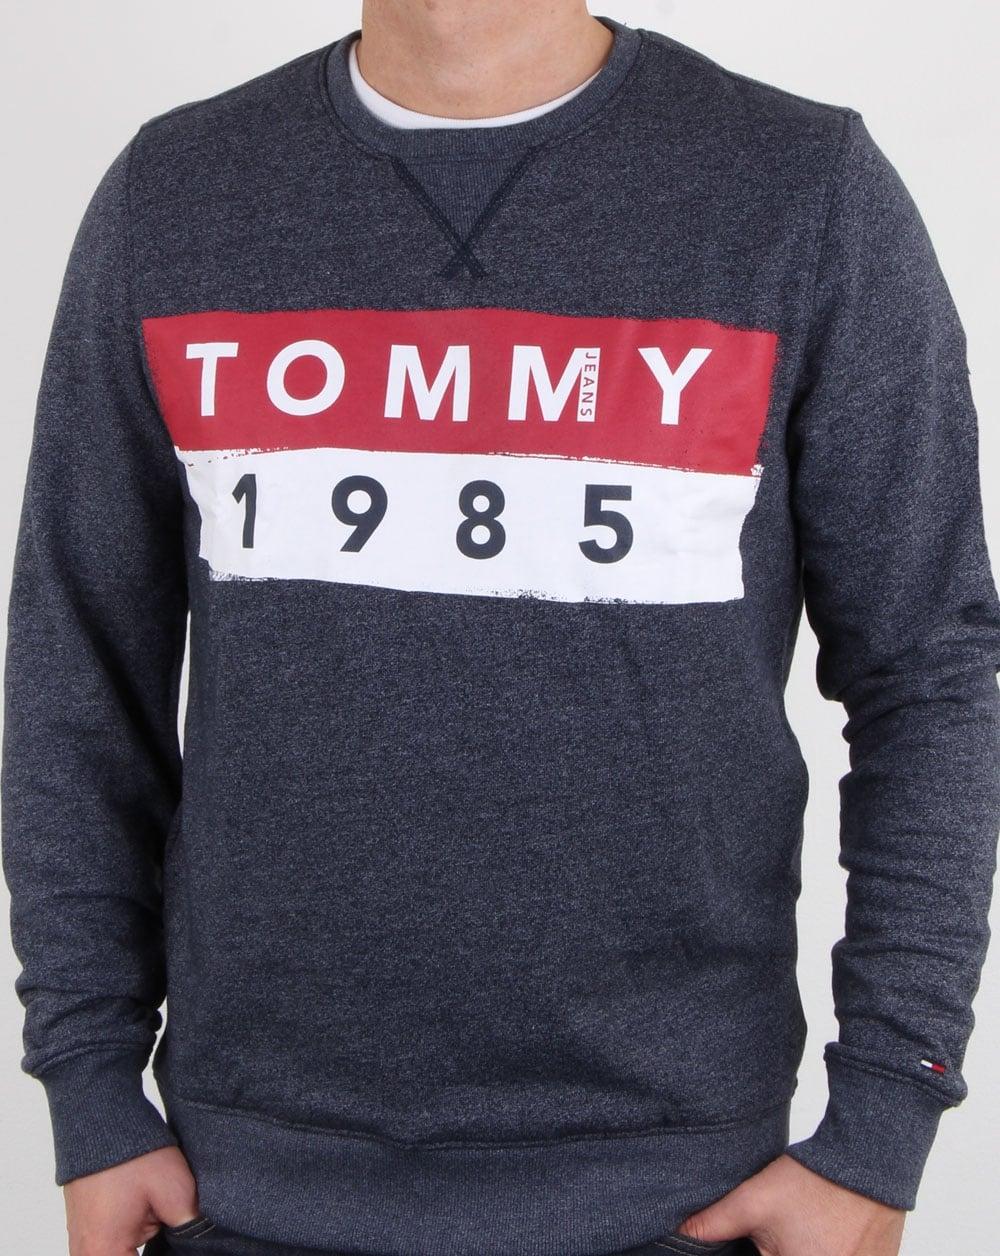 440abae1 Tommy Hilfiger 1985 Logo Sweatshirt Navy, Mens, Crew Neck, Ribber